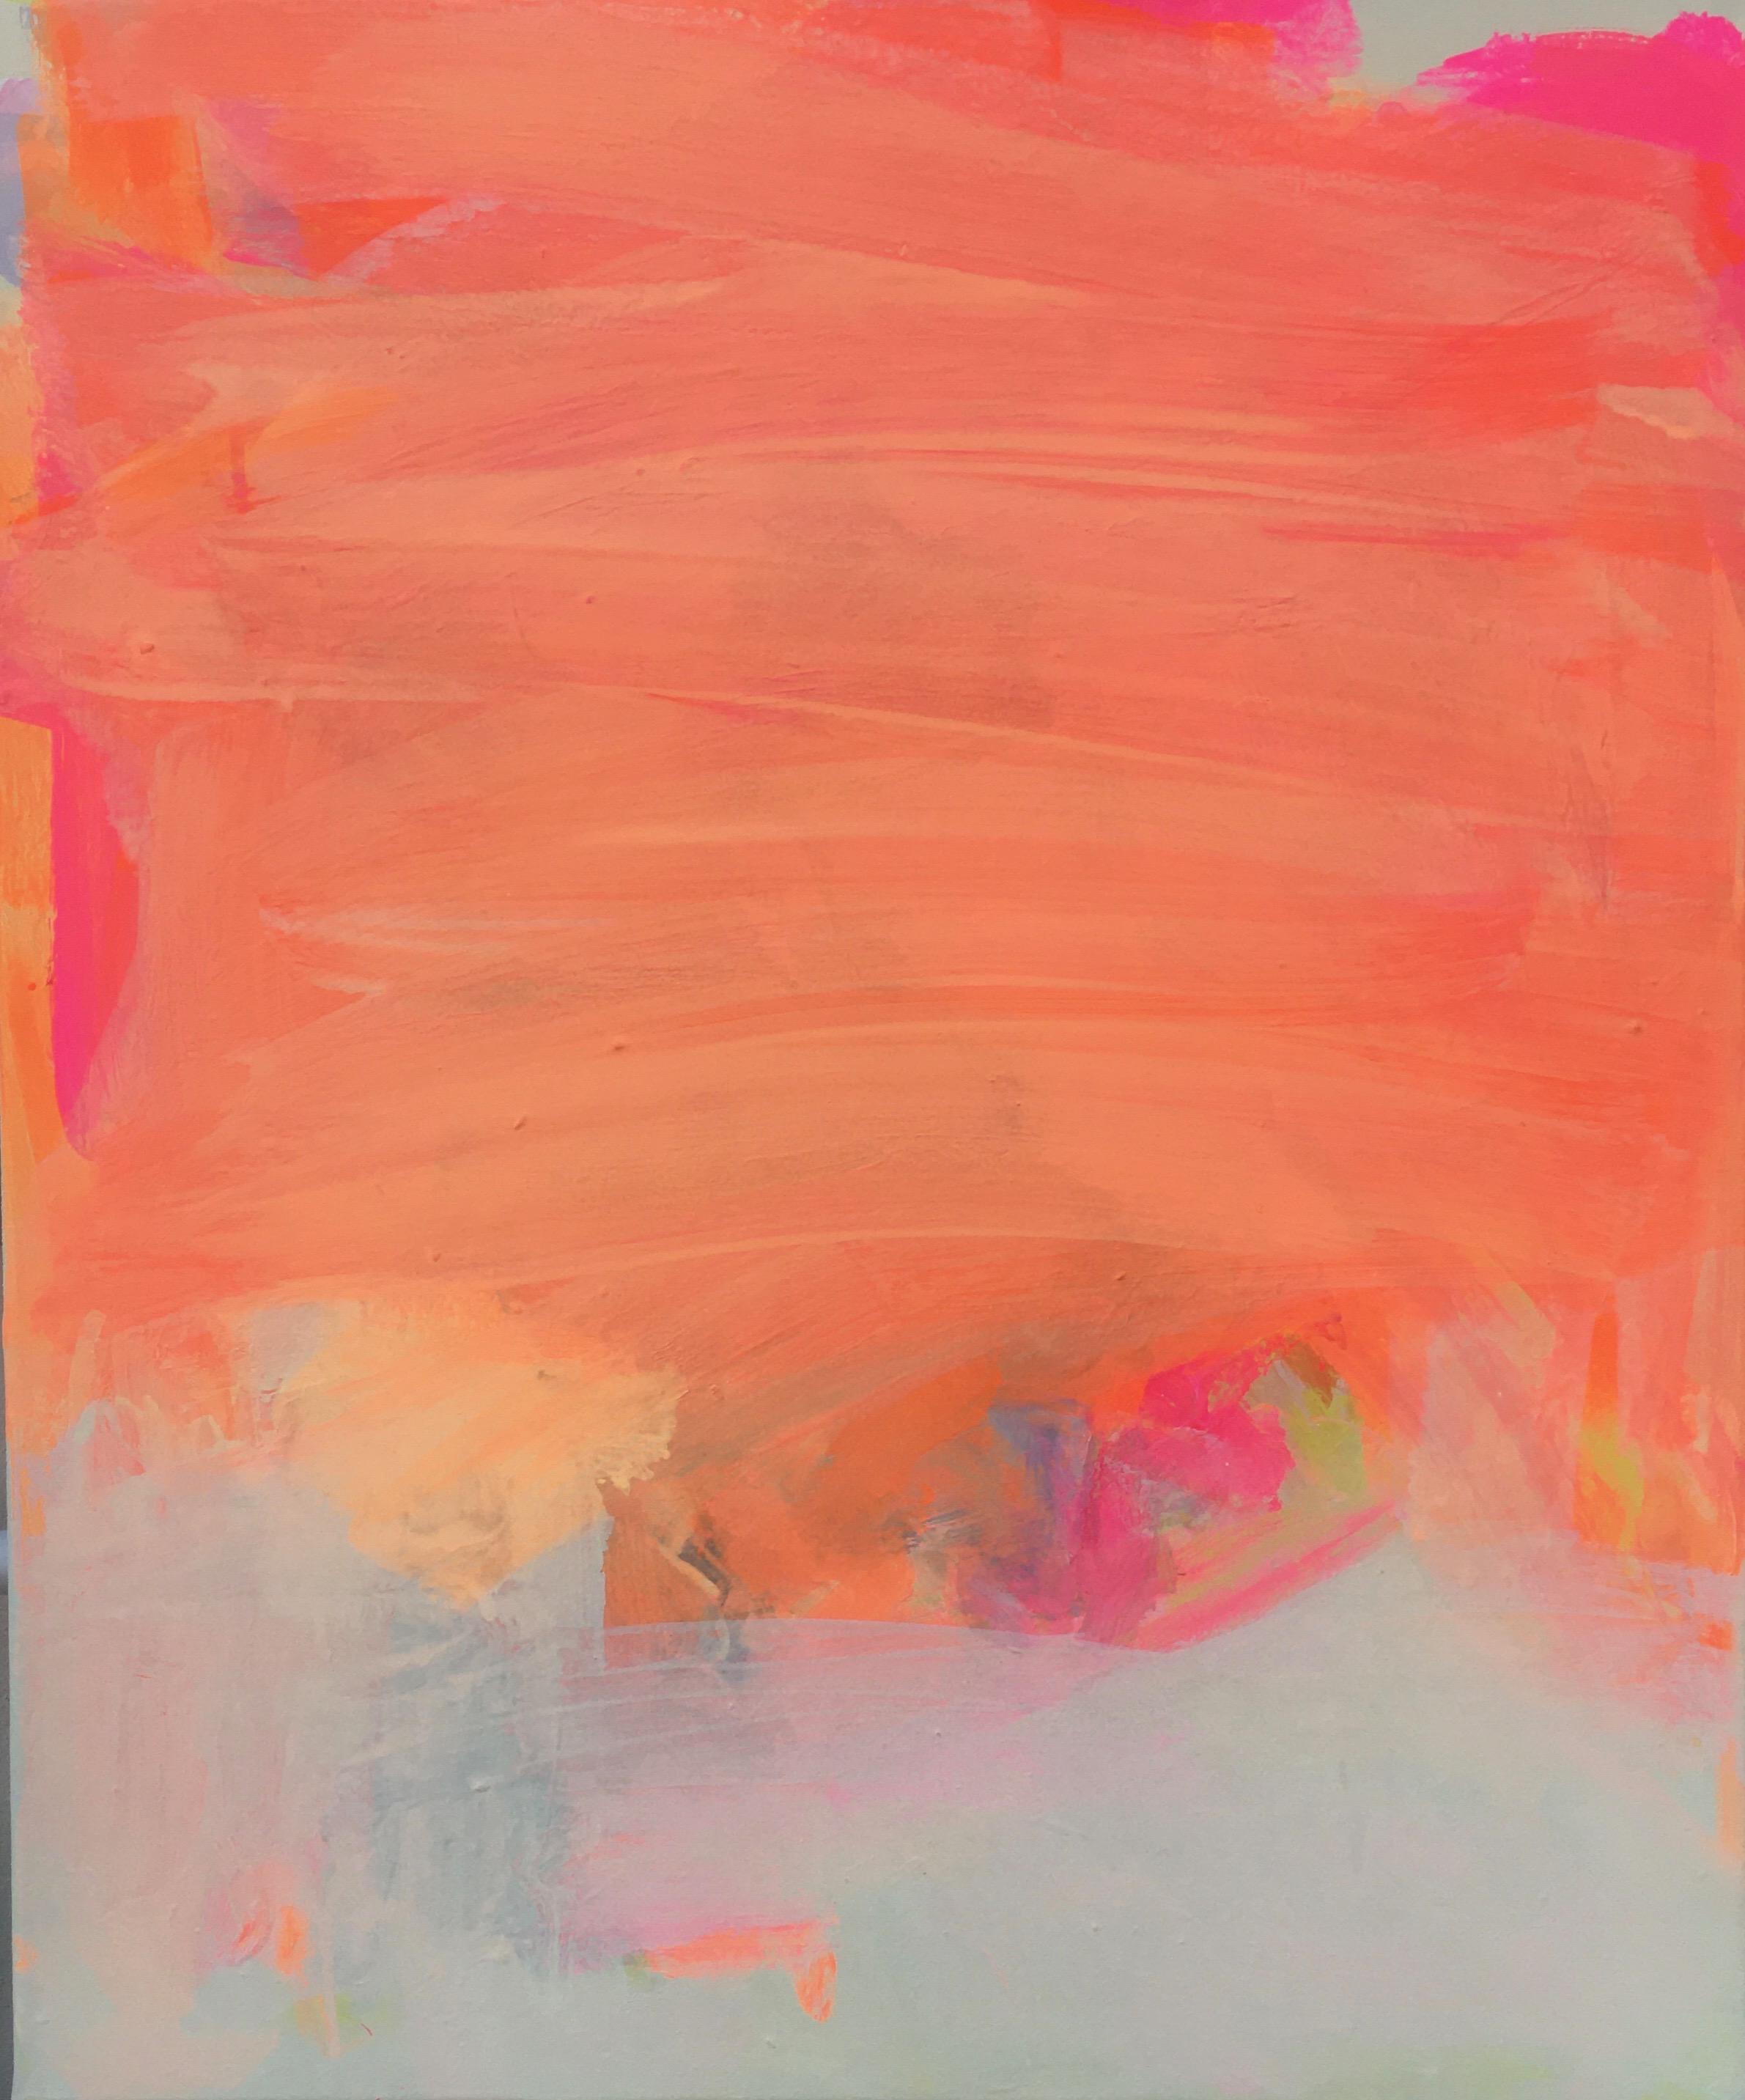 Orange Emotion, 2021, Acryl auf Landwand, 60 x 80cm